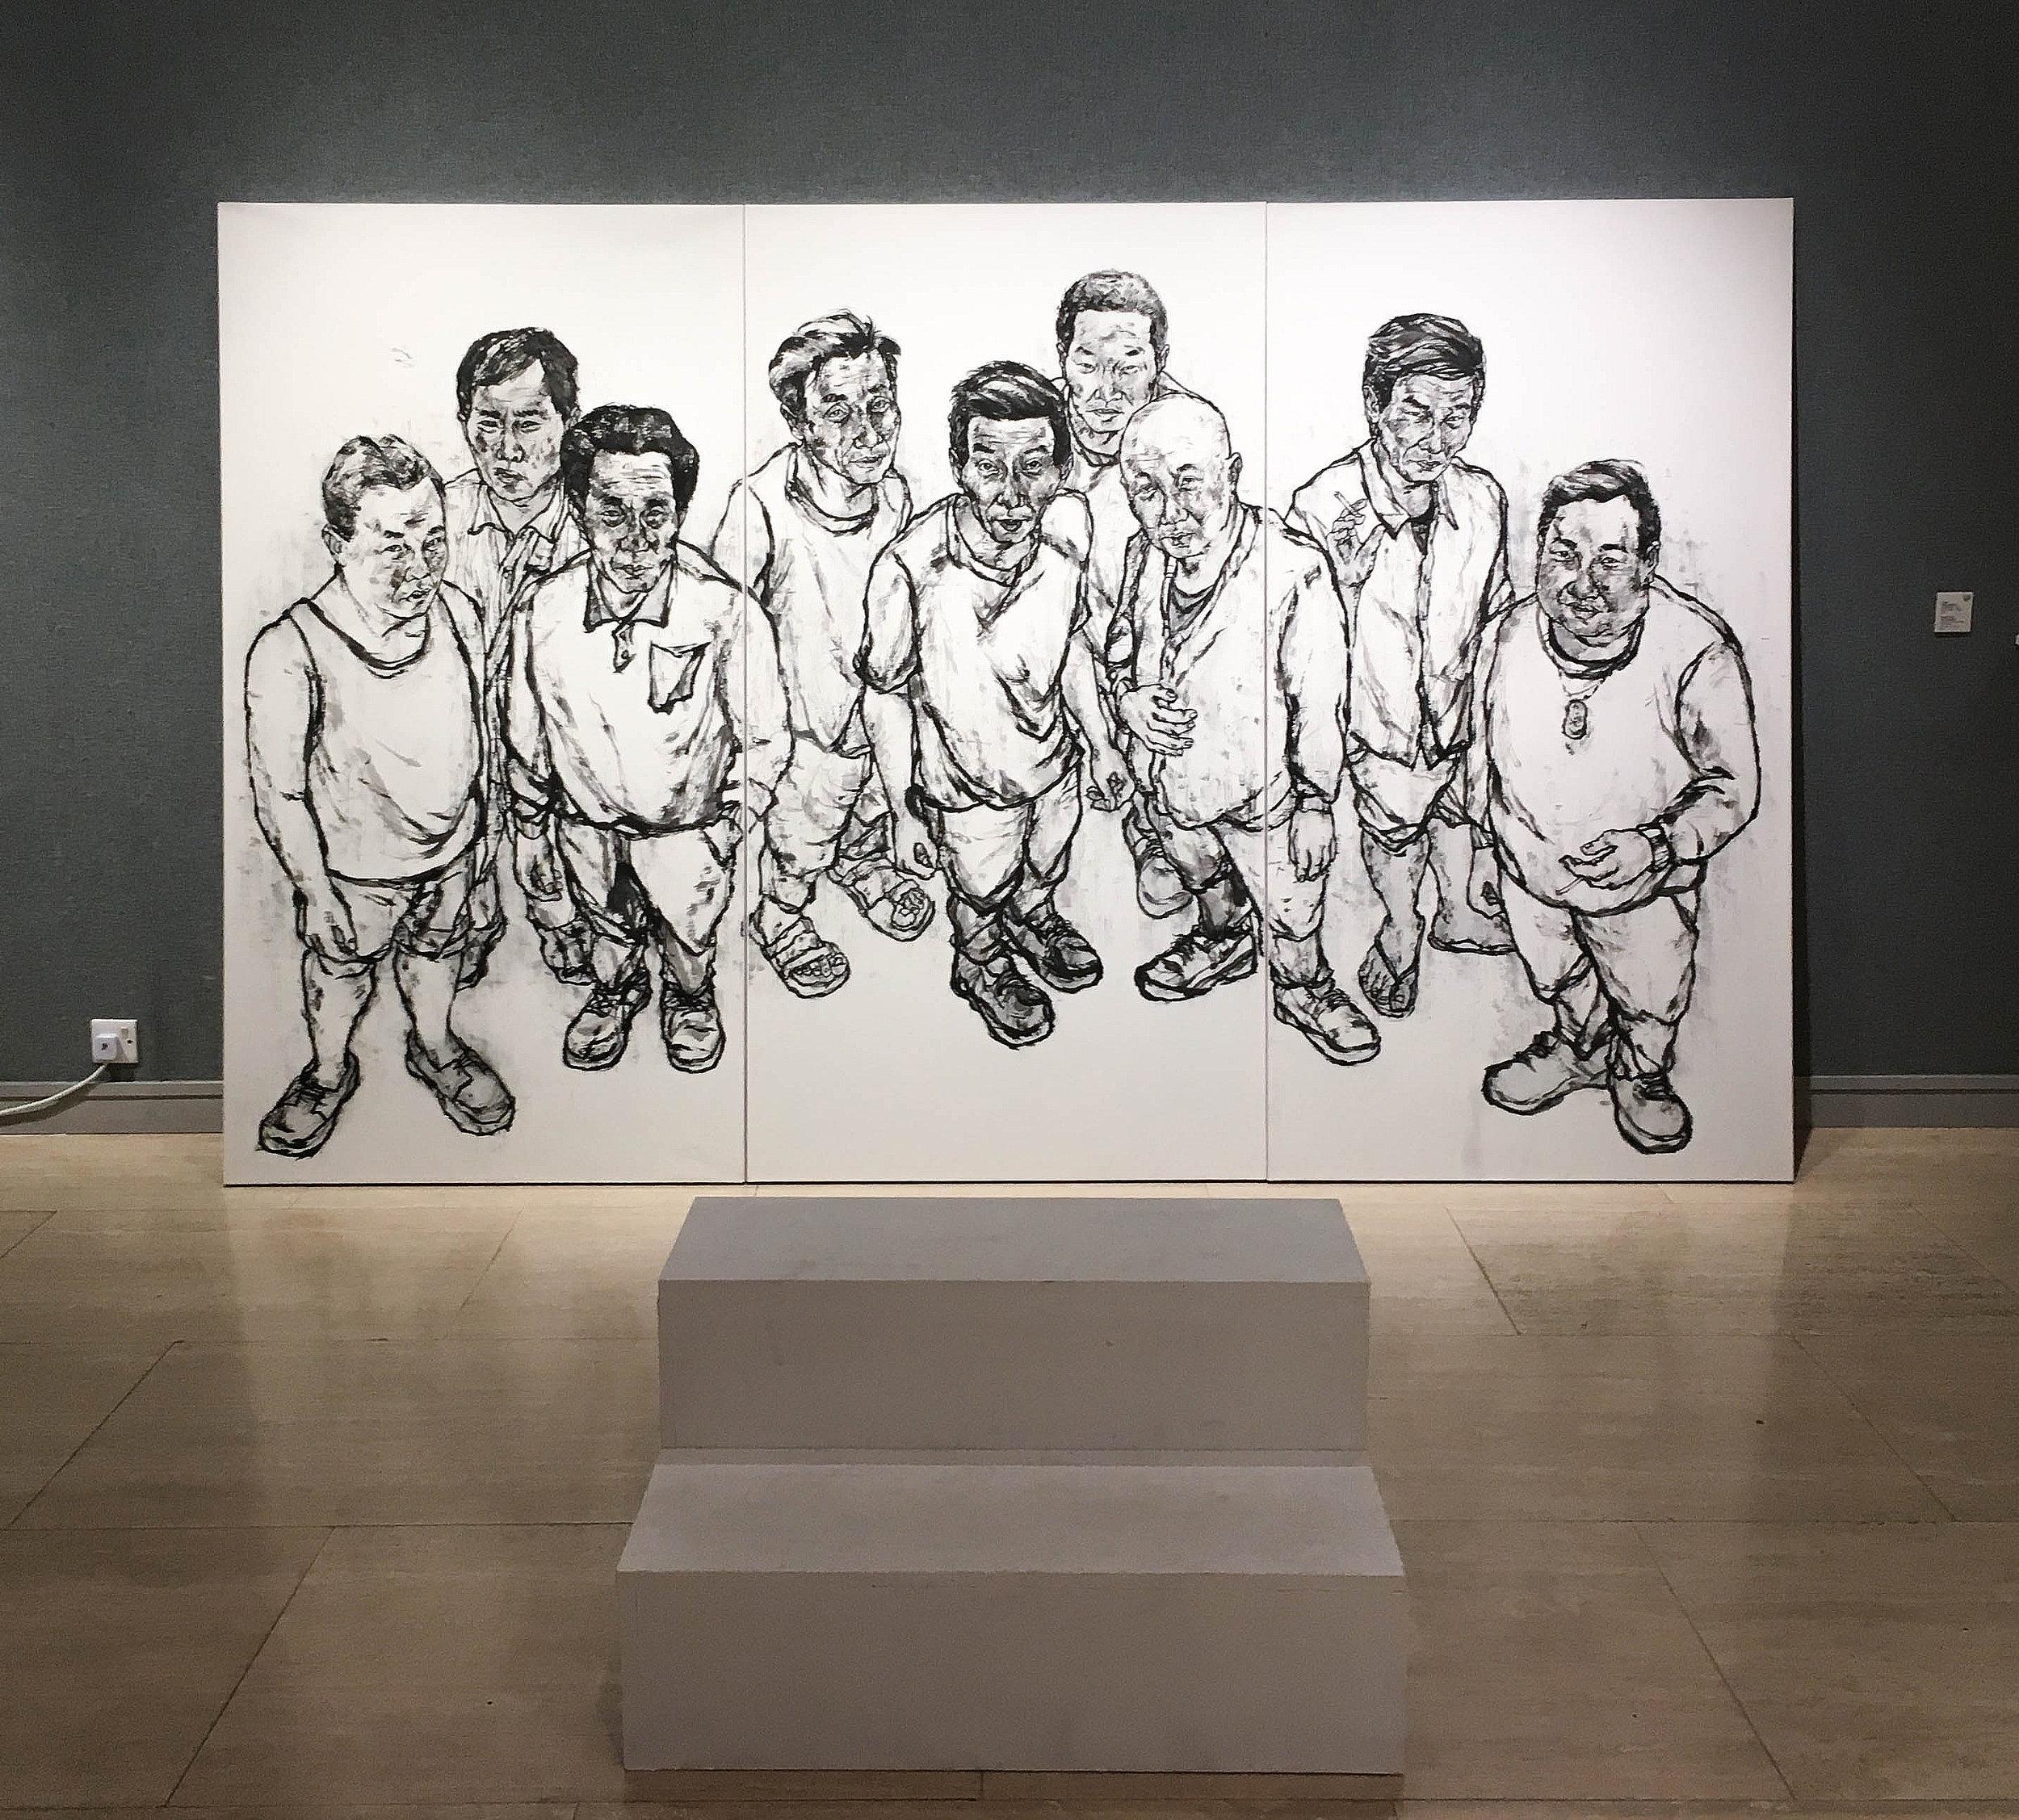 Wong Yuk Shan, 'Those Gazing Mexzxzxzxzn', 2018, ink on Chinese paper, step platform, 97 x 291 cm. Image courtesy the artist and Fresh Trend.